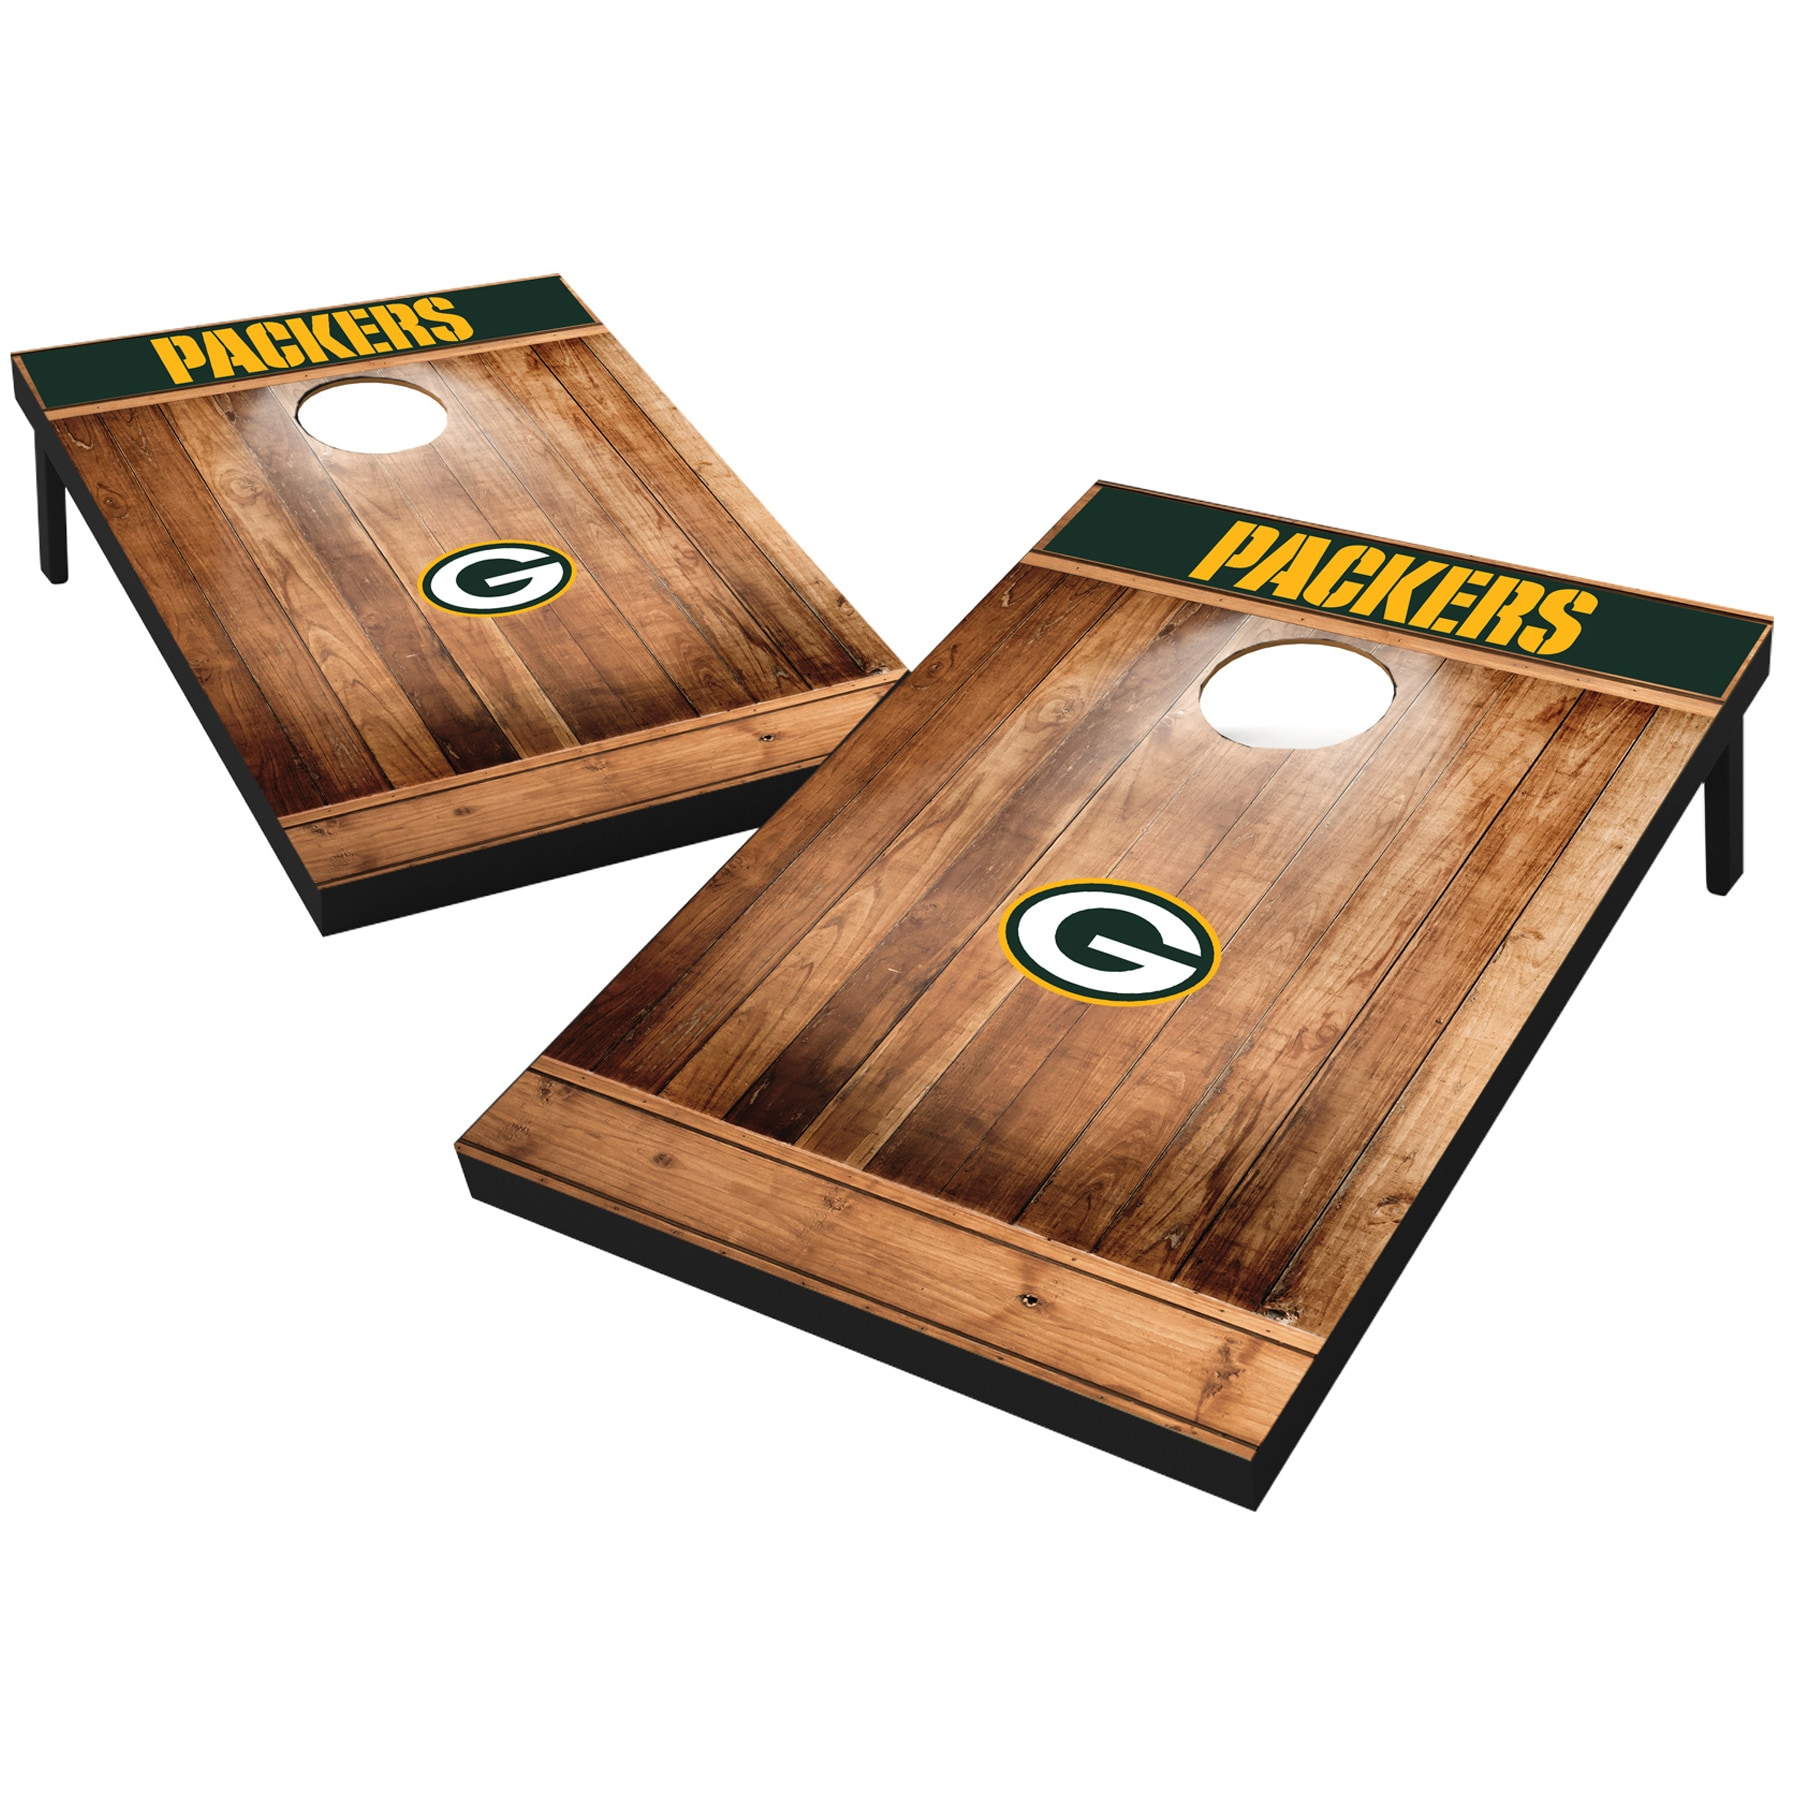 Green Bay Packers 2' x 3' Wood Design Cornhole Board Tailgate Toss Set